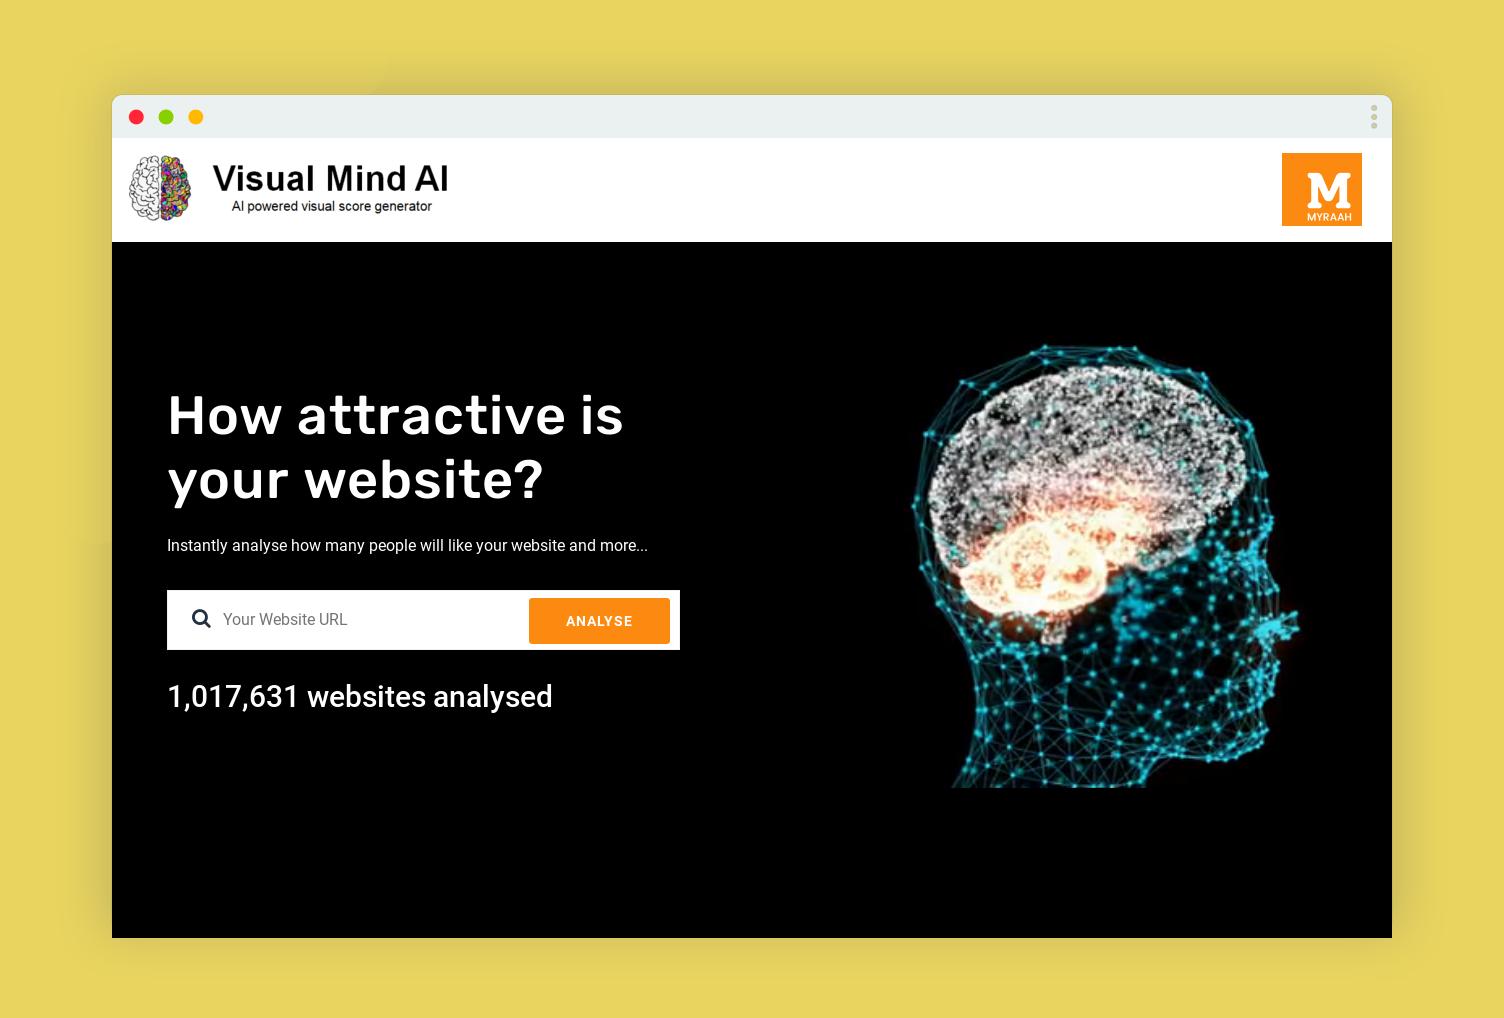 VisualMind,AI智能分析网站受欢迎度-爱资源网 , 专注分享实用软件工具&资源教程